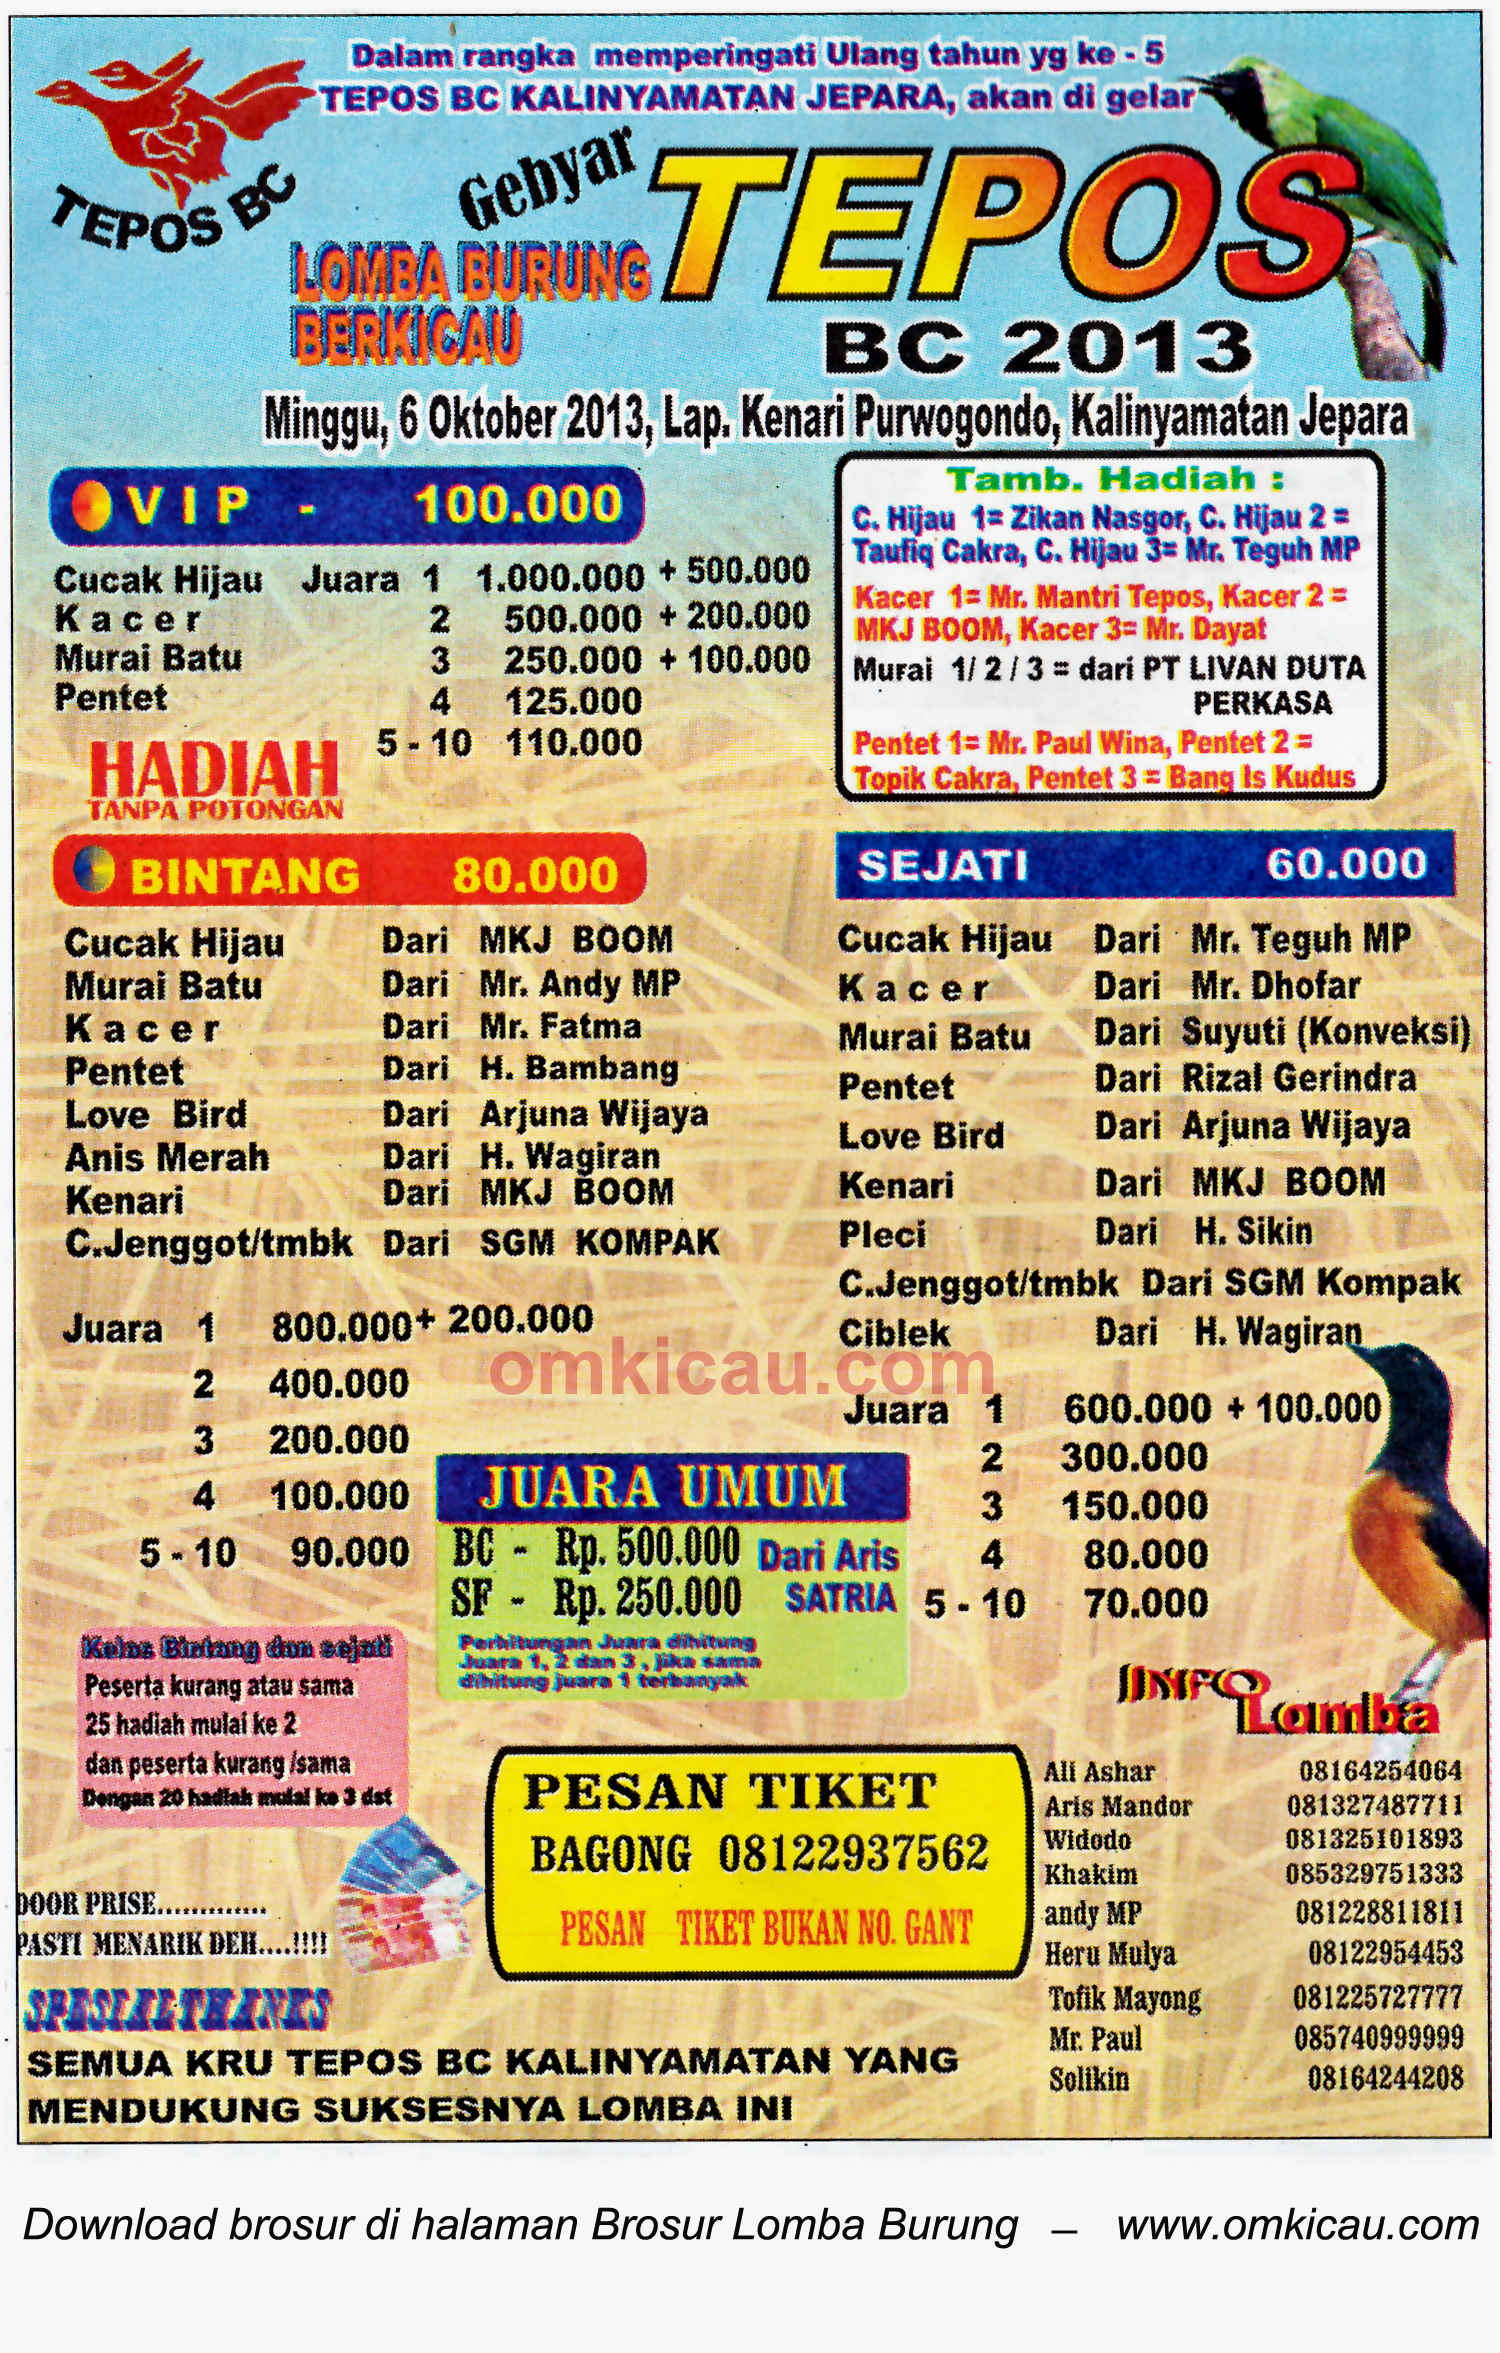 Brosur Lomba Burung Berkicau Tepos BC, Jepara, 6 Oktober 2013